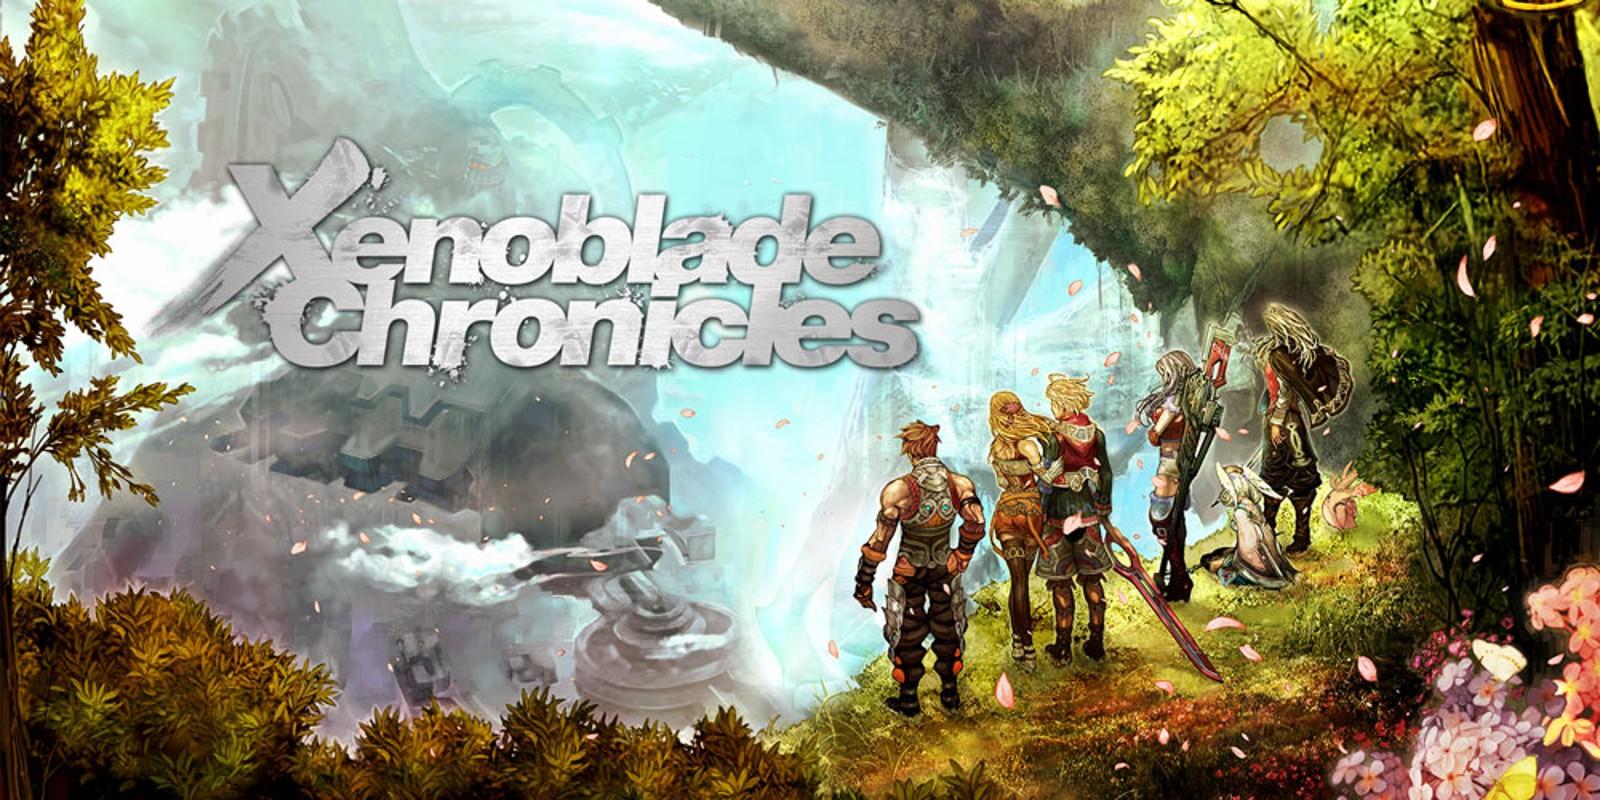 Wii U Xenoblade Chronicles